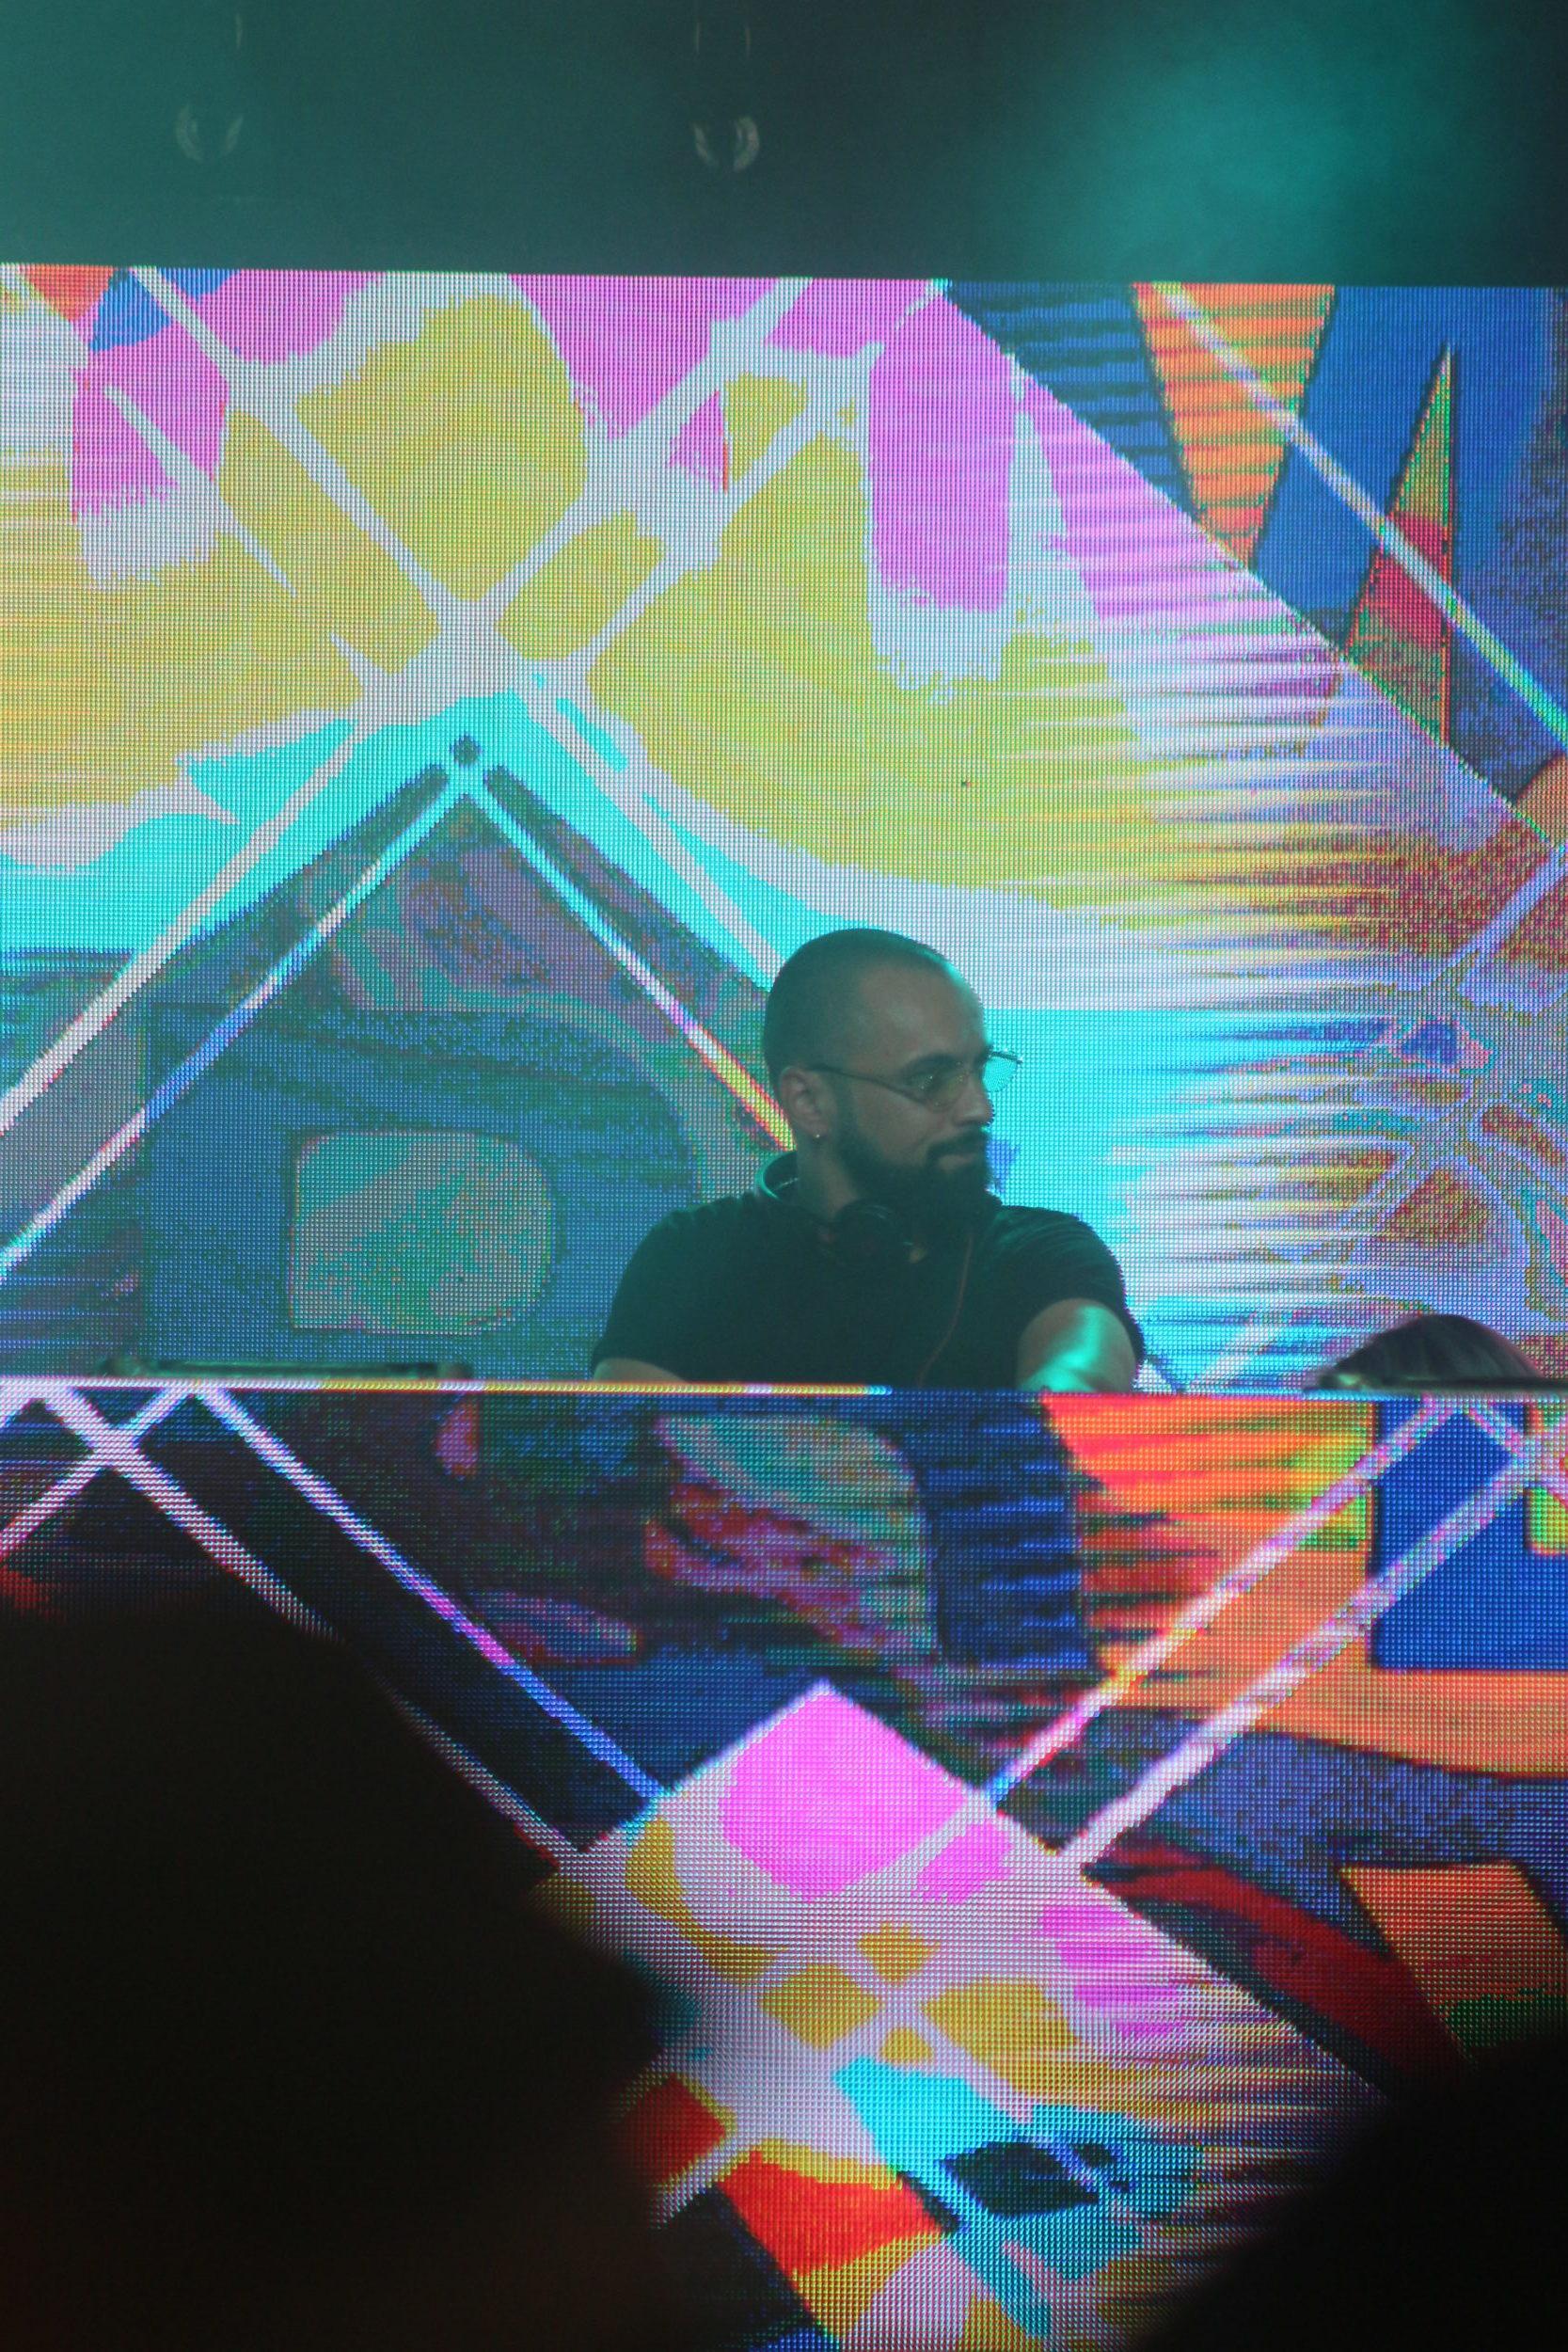 Dombresky performs at Shaky Beats 2019